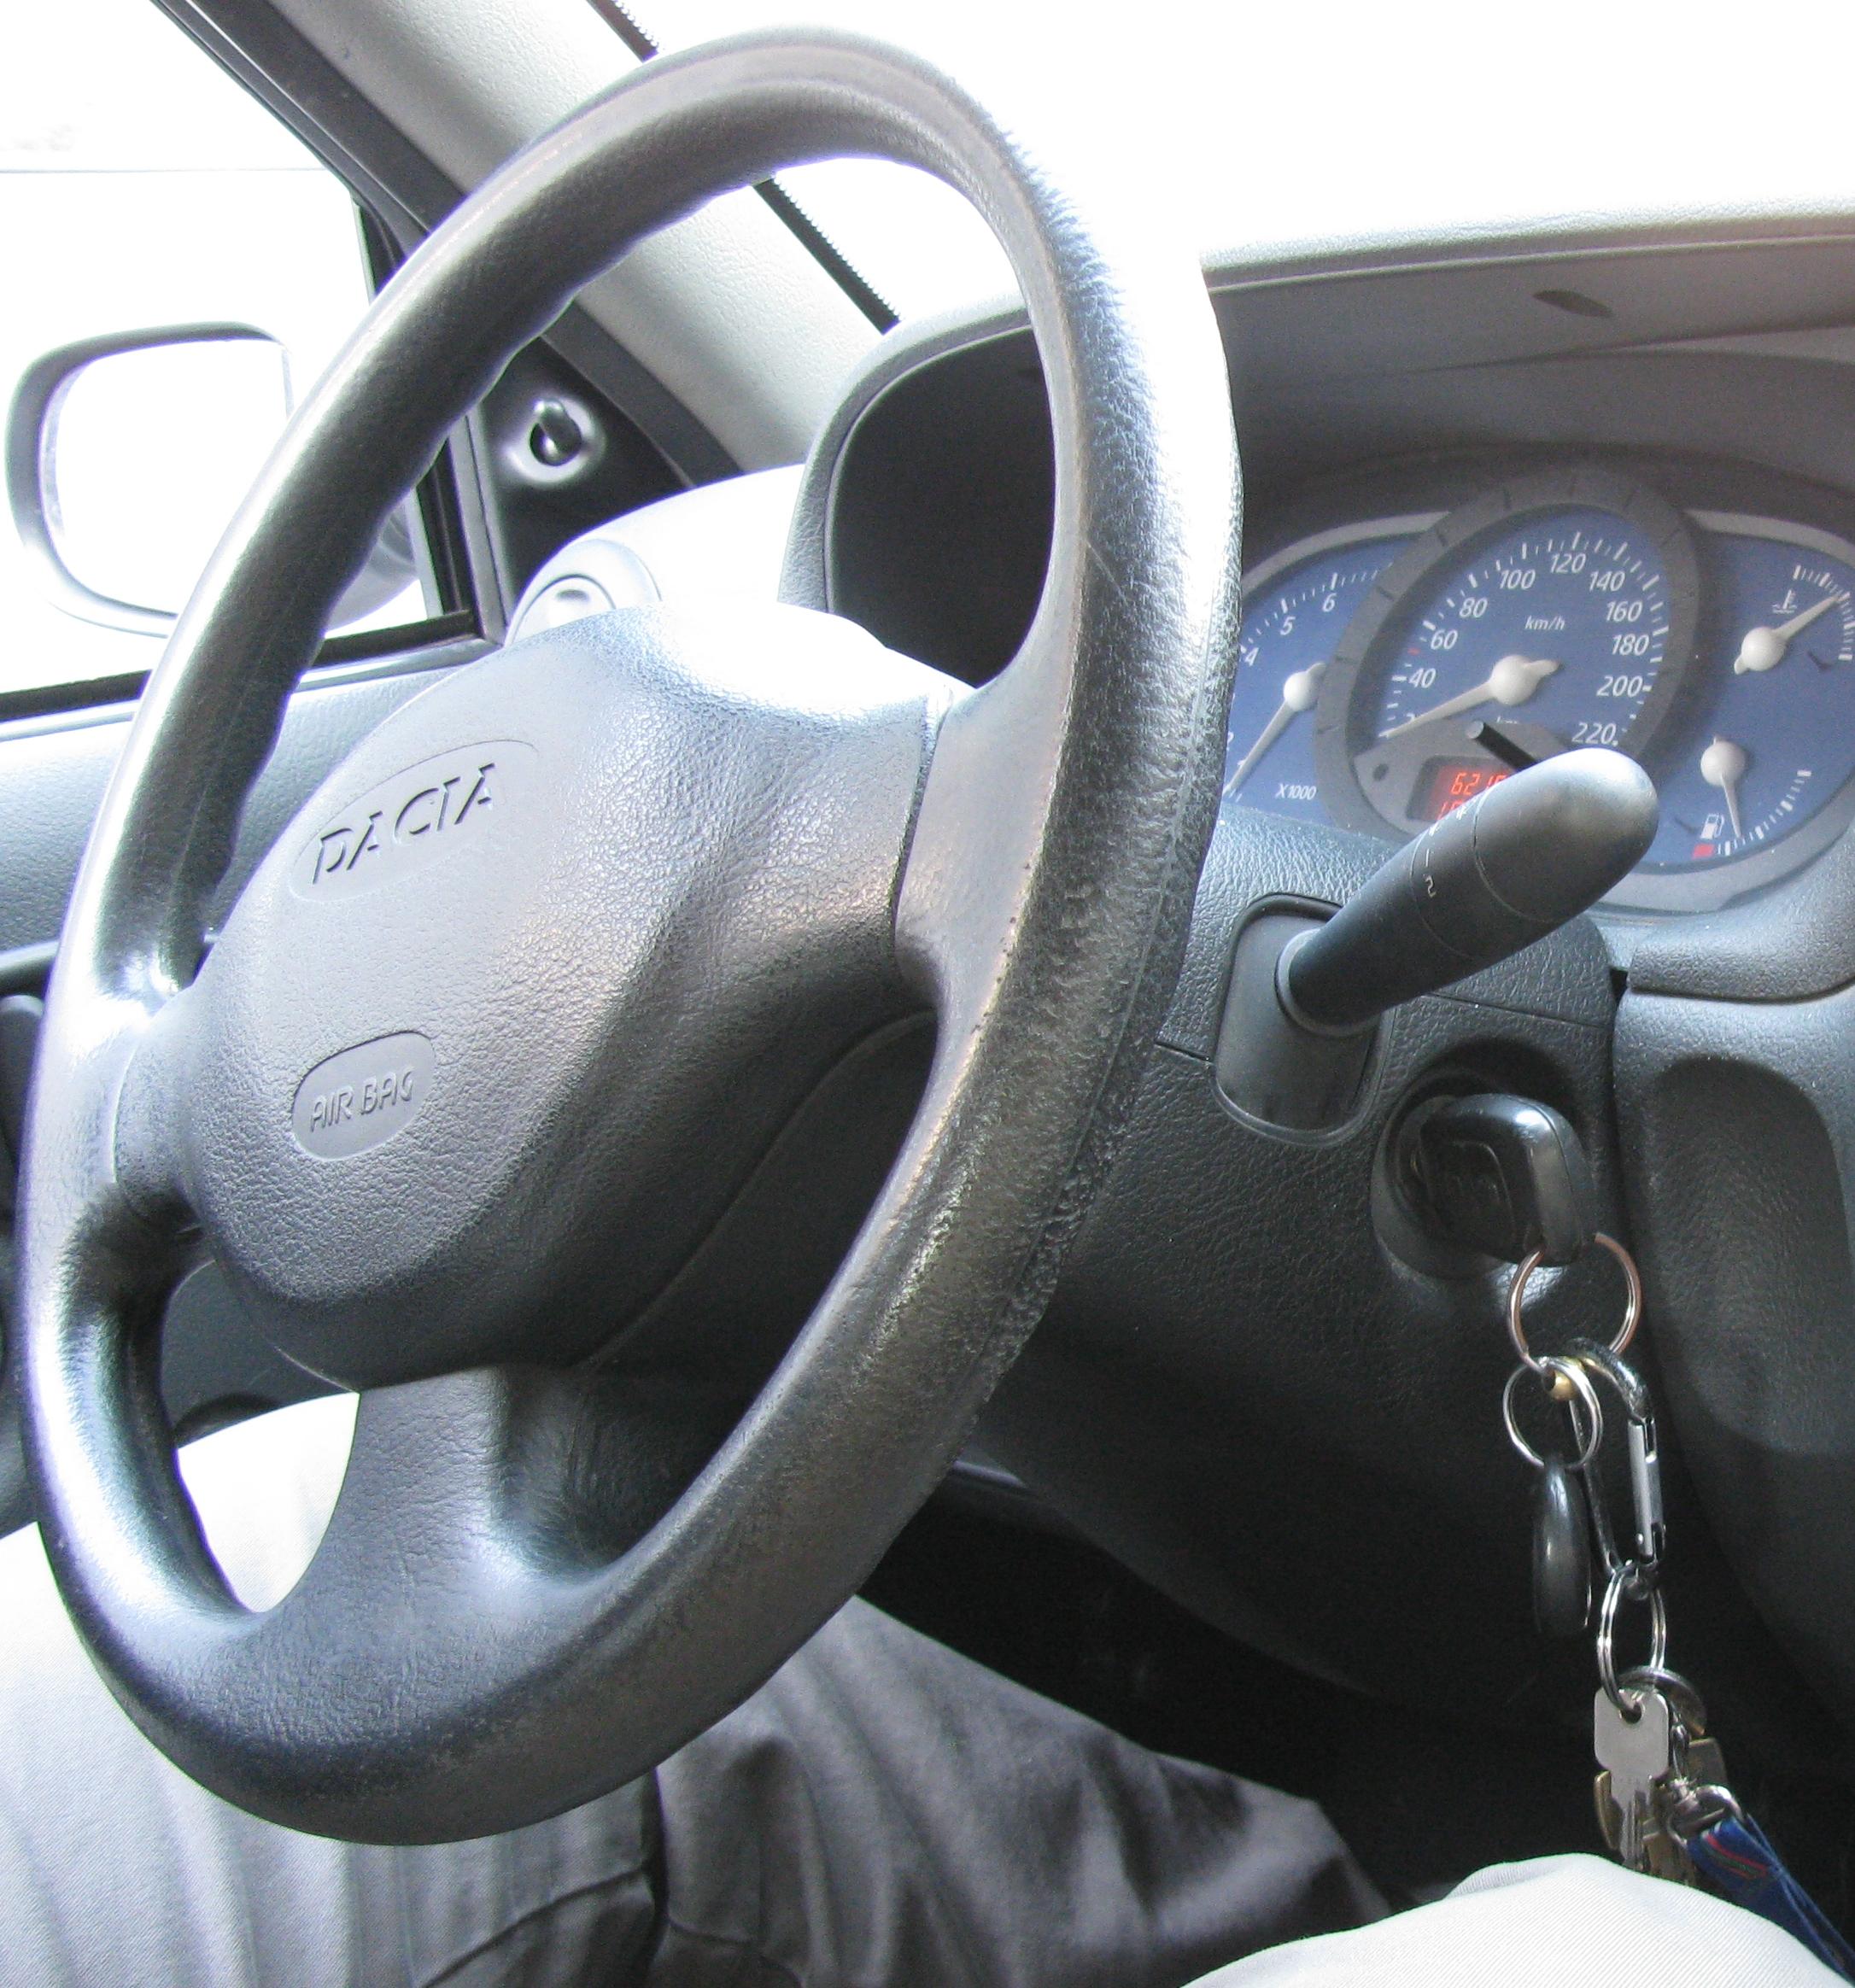 Car keys locked in ignition